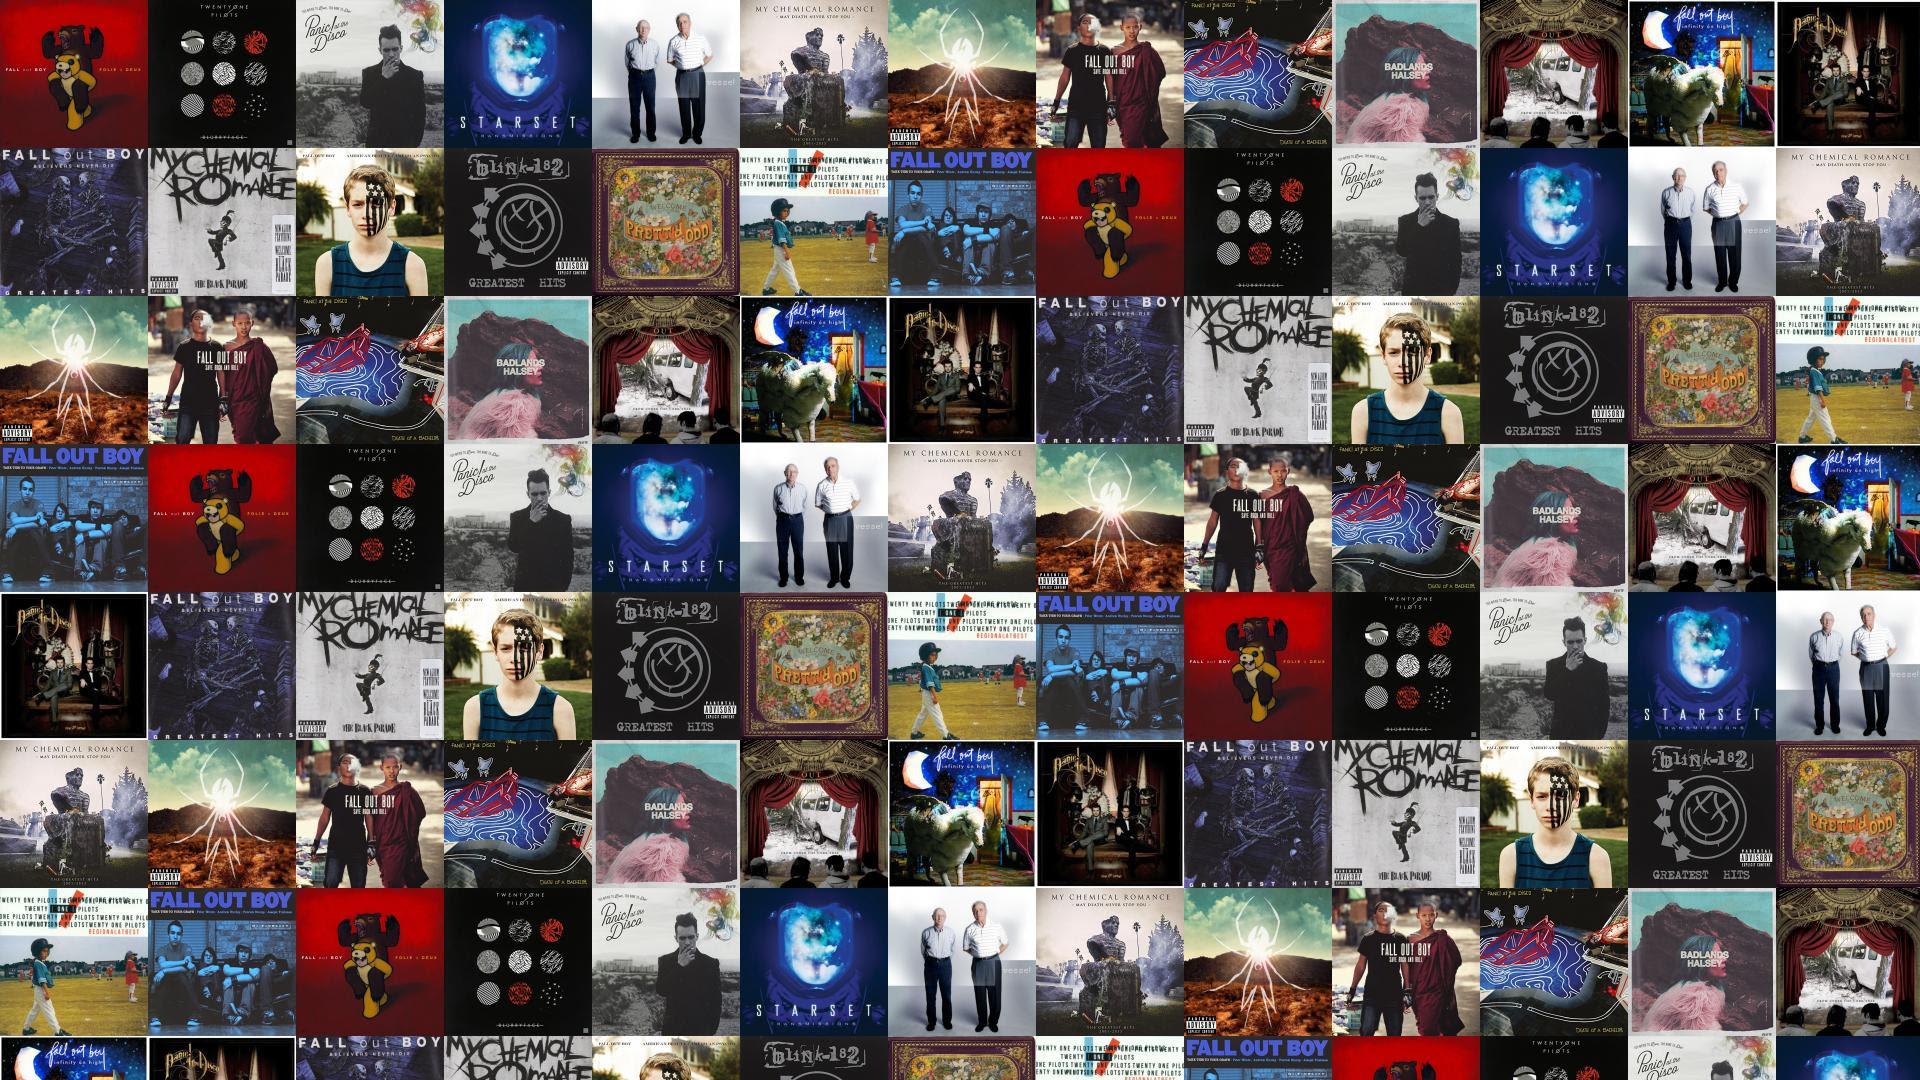 Fall Out Boy Folie Deux Twenty One Pilots Wallpaper Tiled